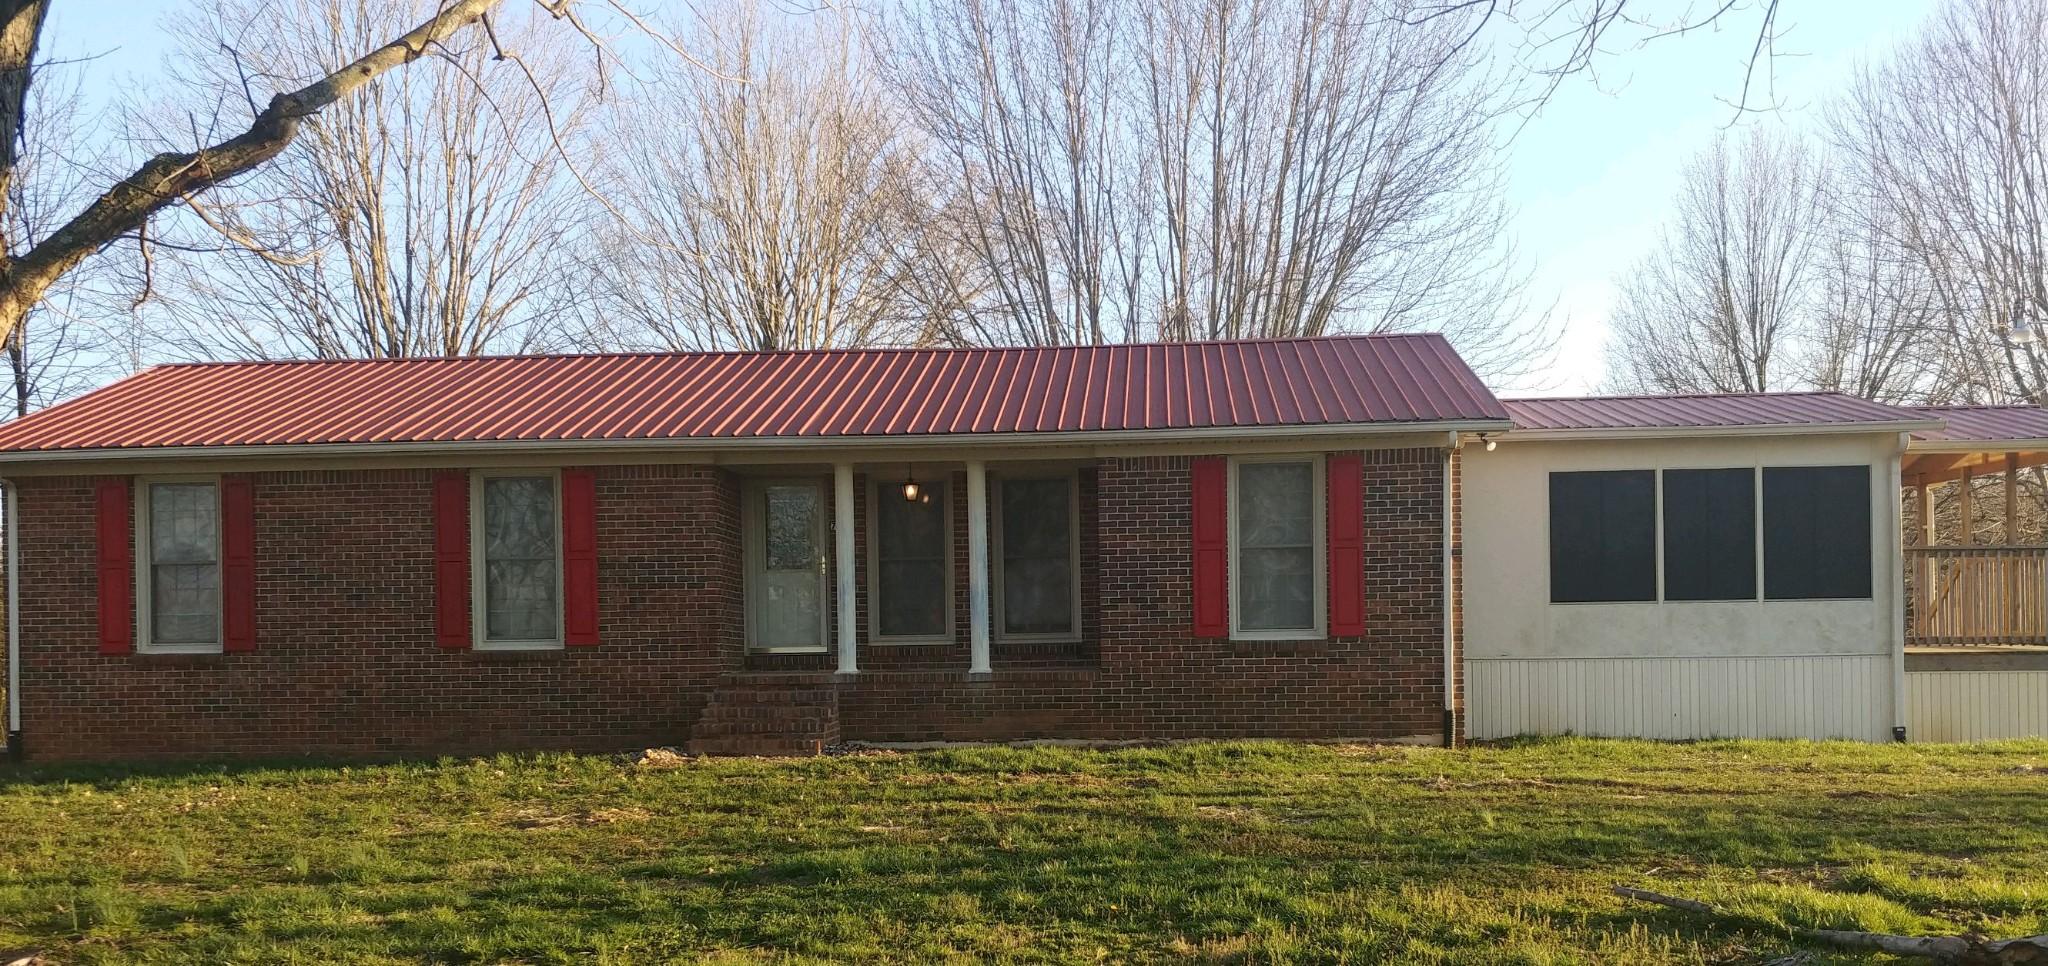 700 Pedigo Rd, Mc Minnville, TN 37110 - Mc Minnville, TN real estate listing